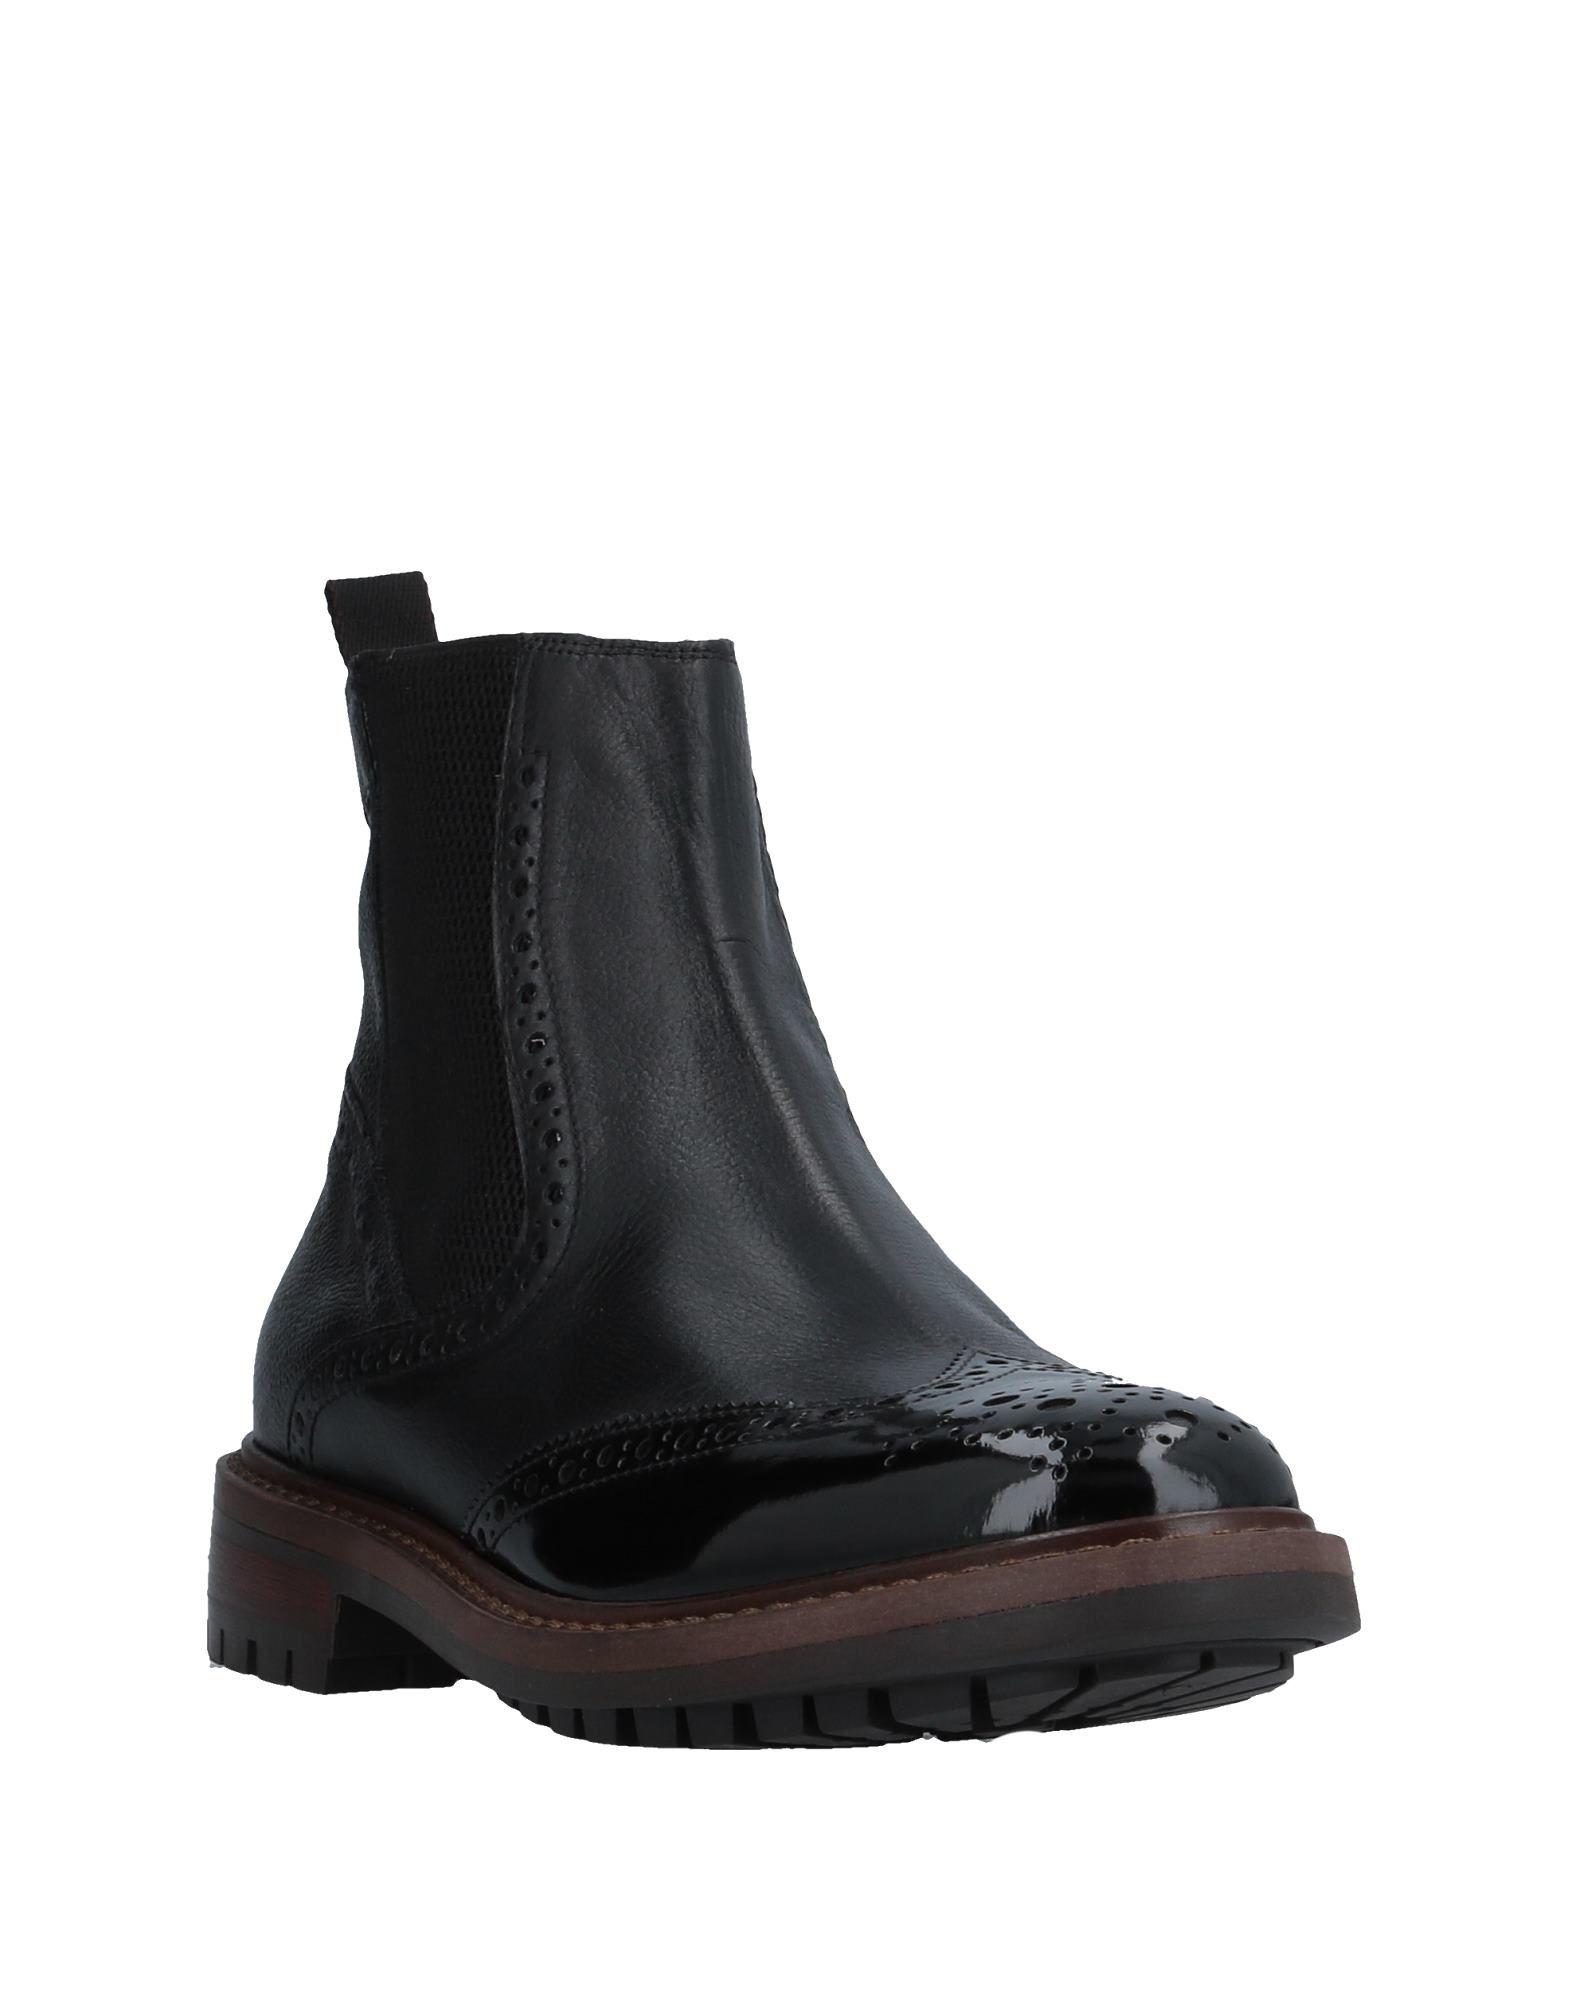 Rabatt echte Schuhe Herren Dama Stiefelette Herren Schuhe  11511838HO 2dcd36